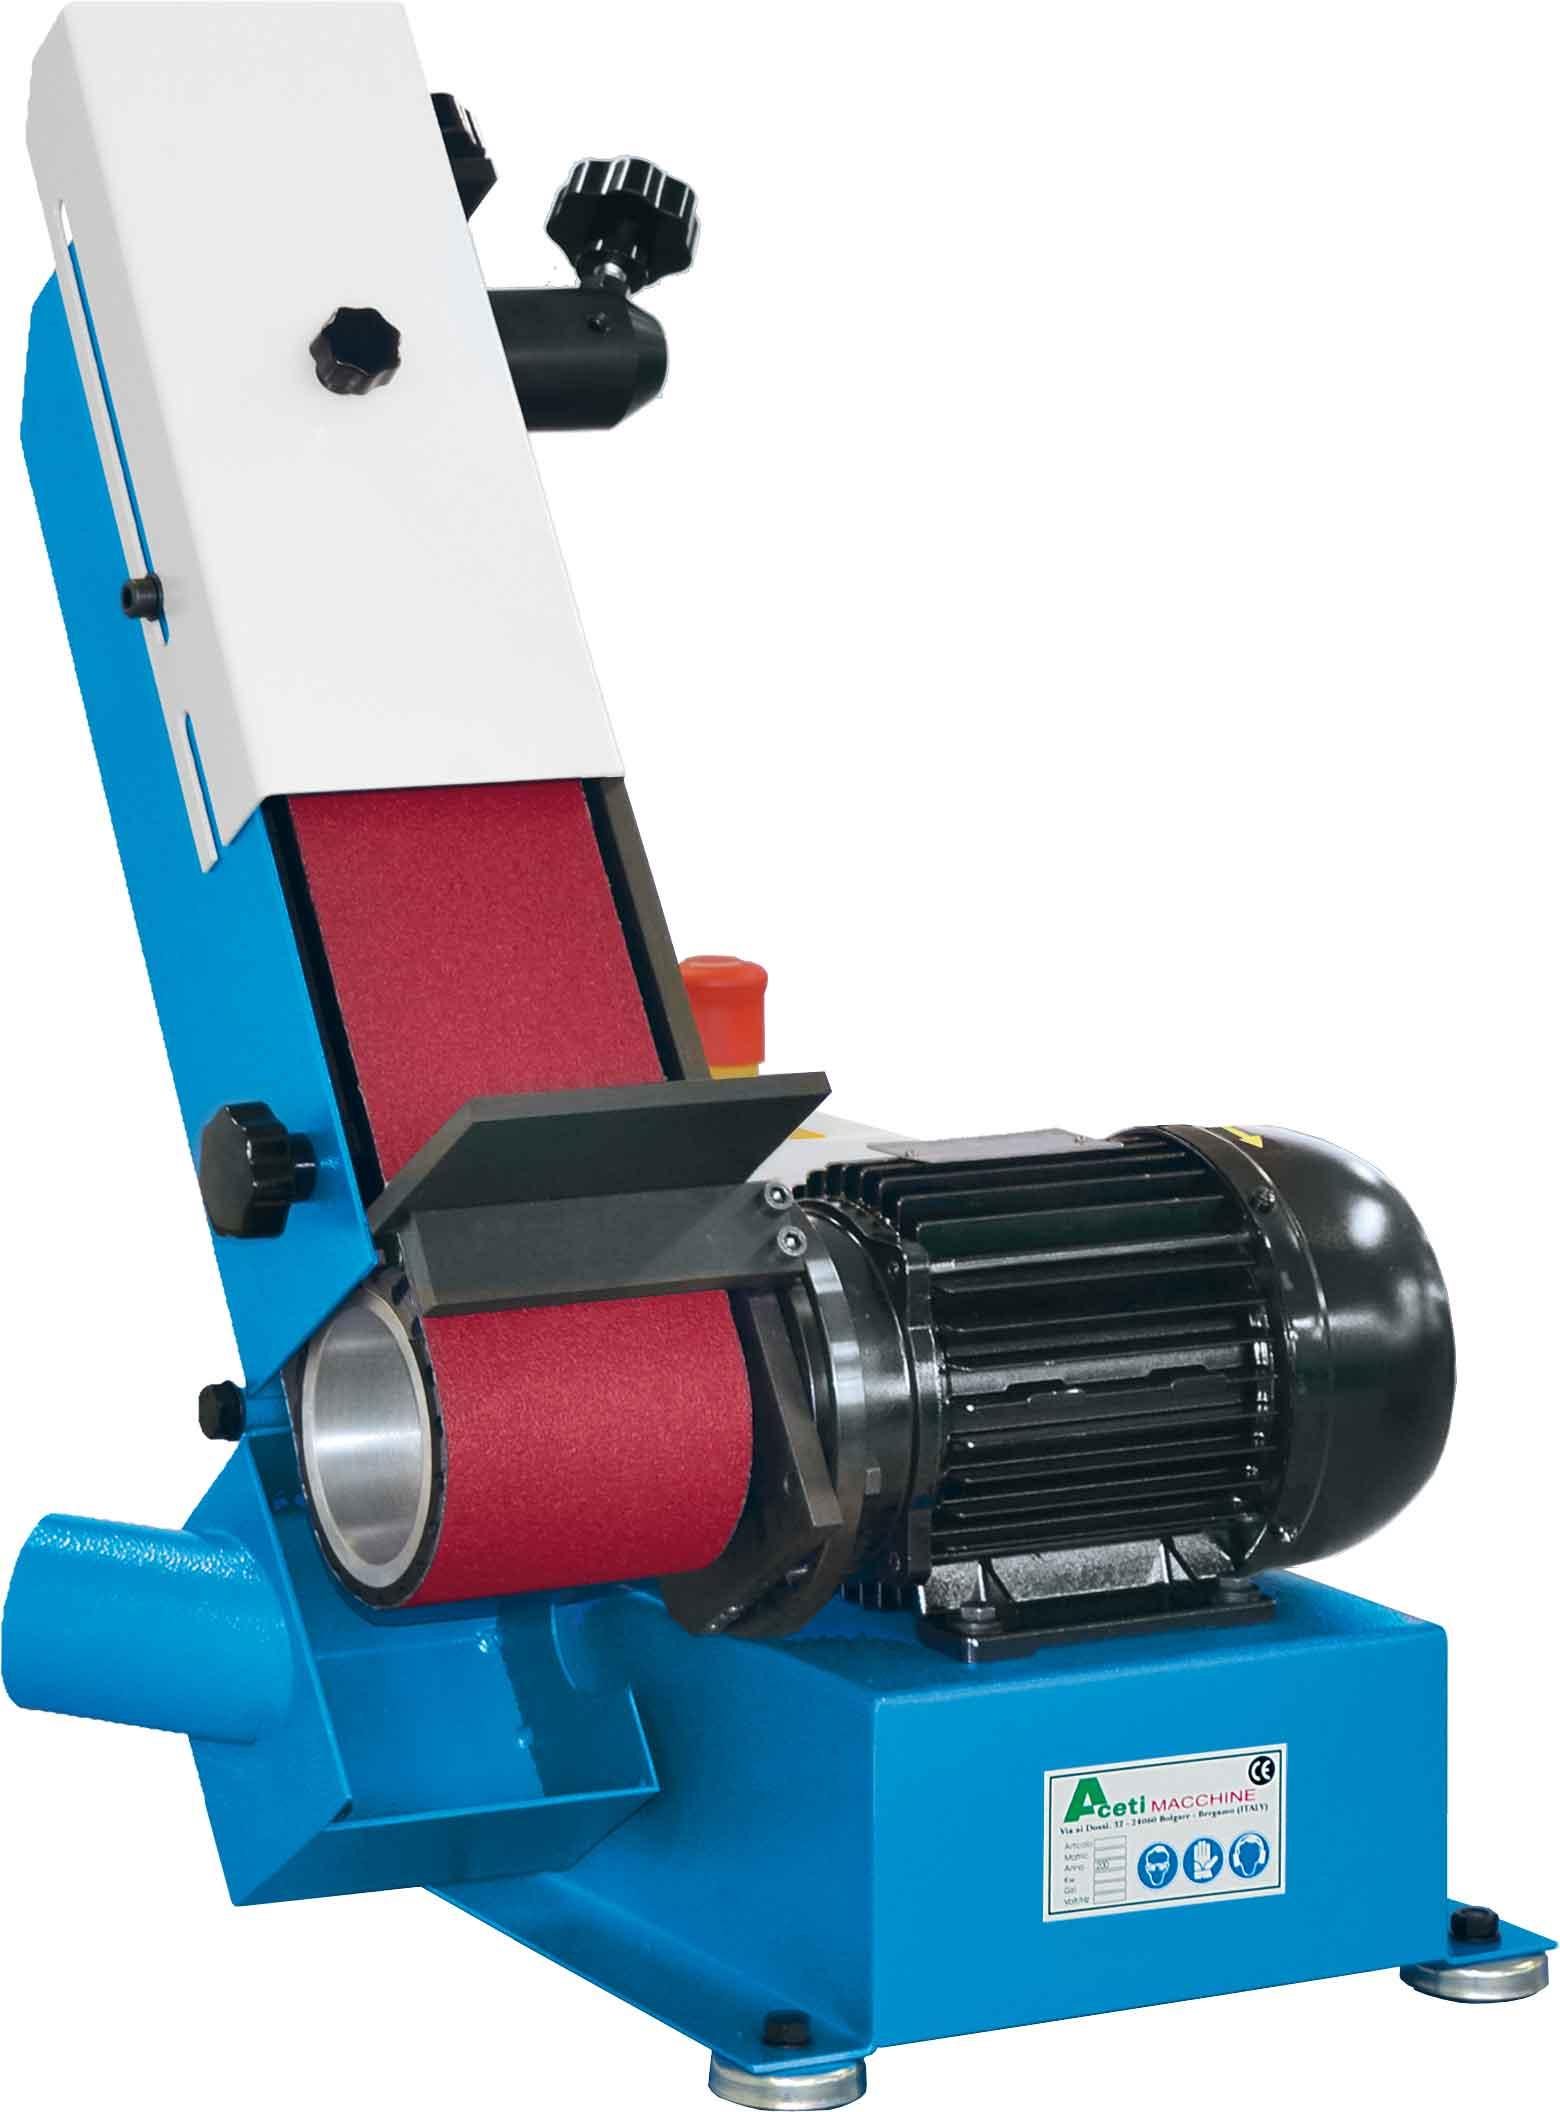 ART.22 - Belt grinding machine